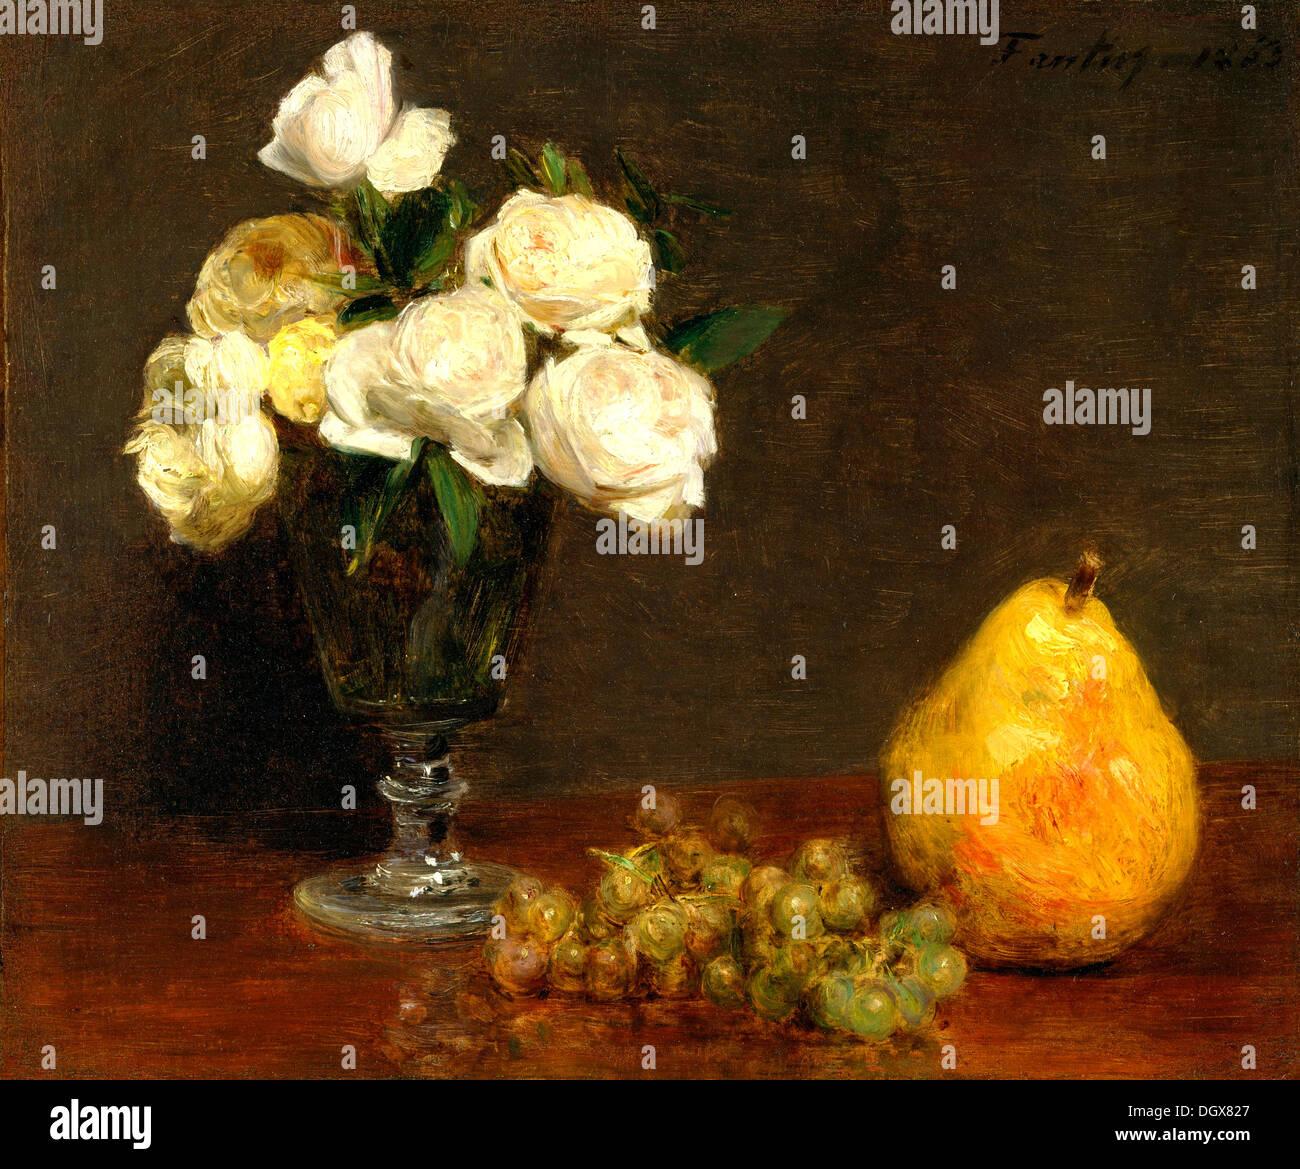 Nature morte avec roses et fruits - par Henri Fantin-Latour, 1863 Photo Stock